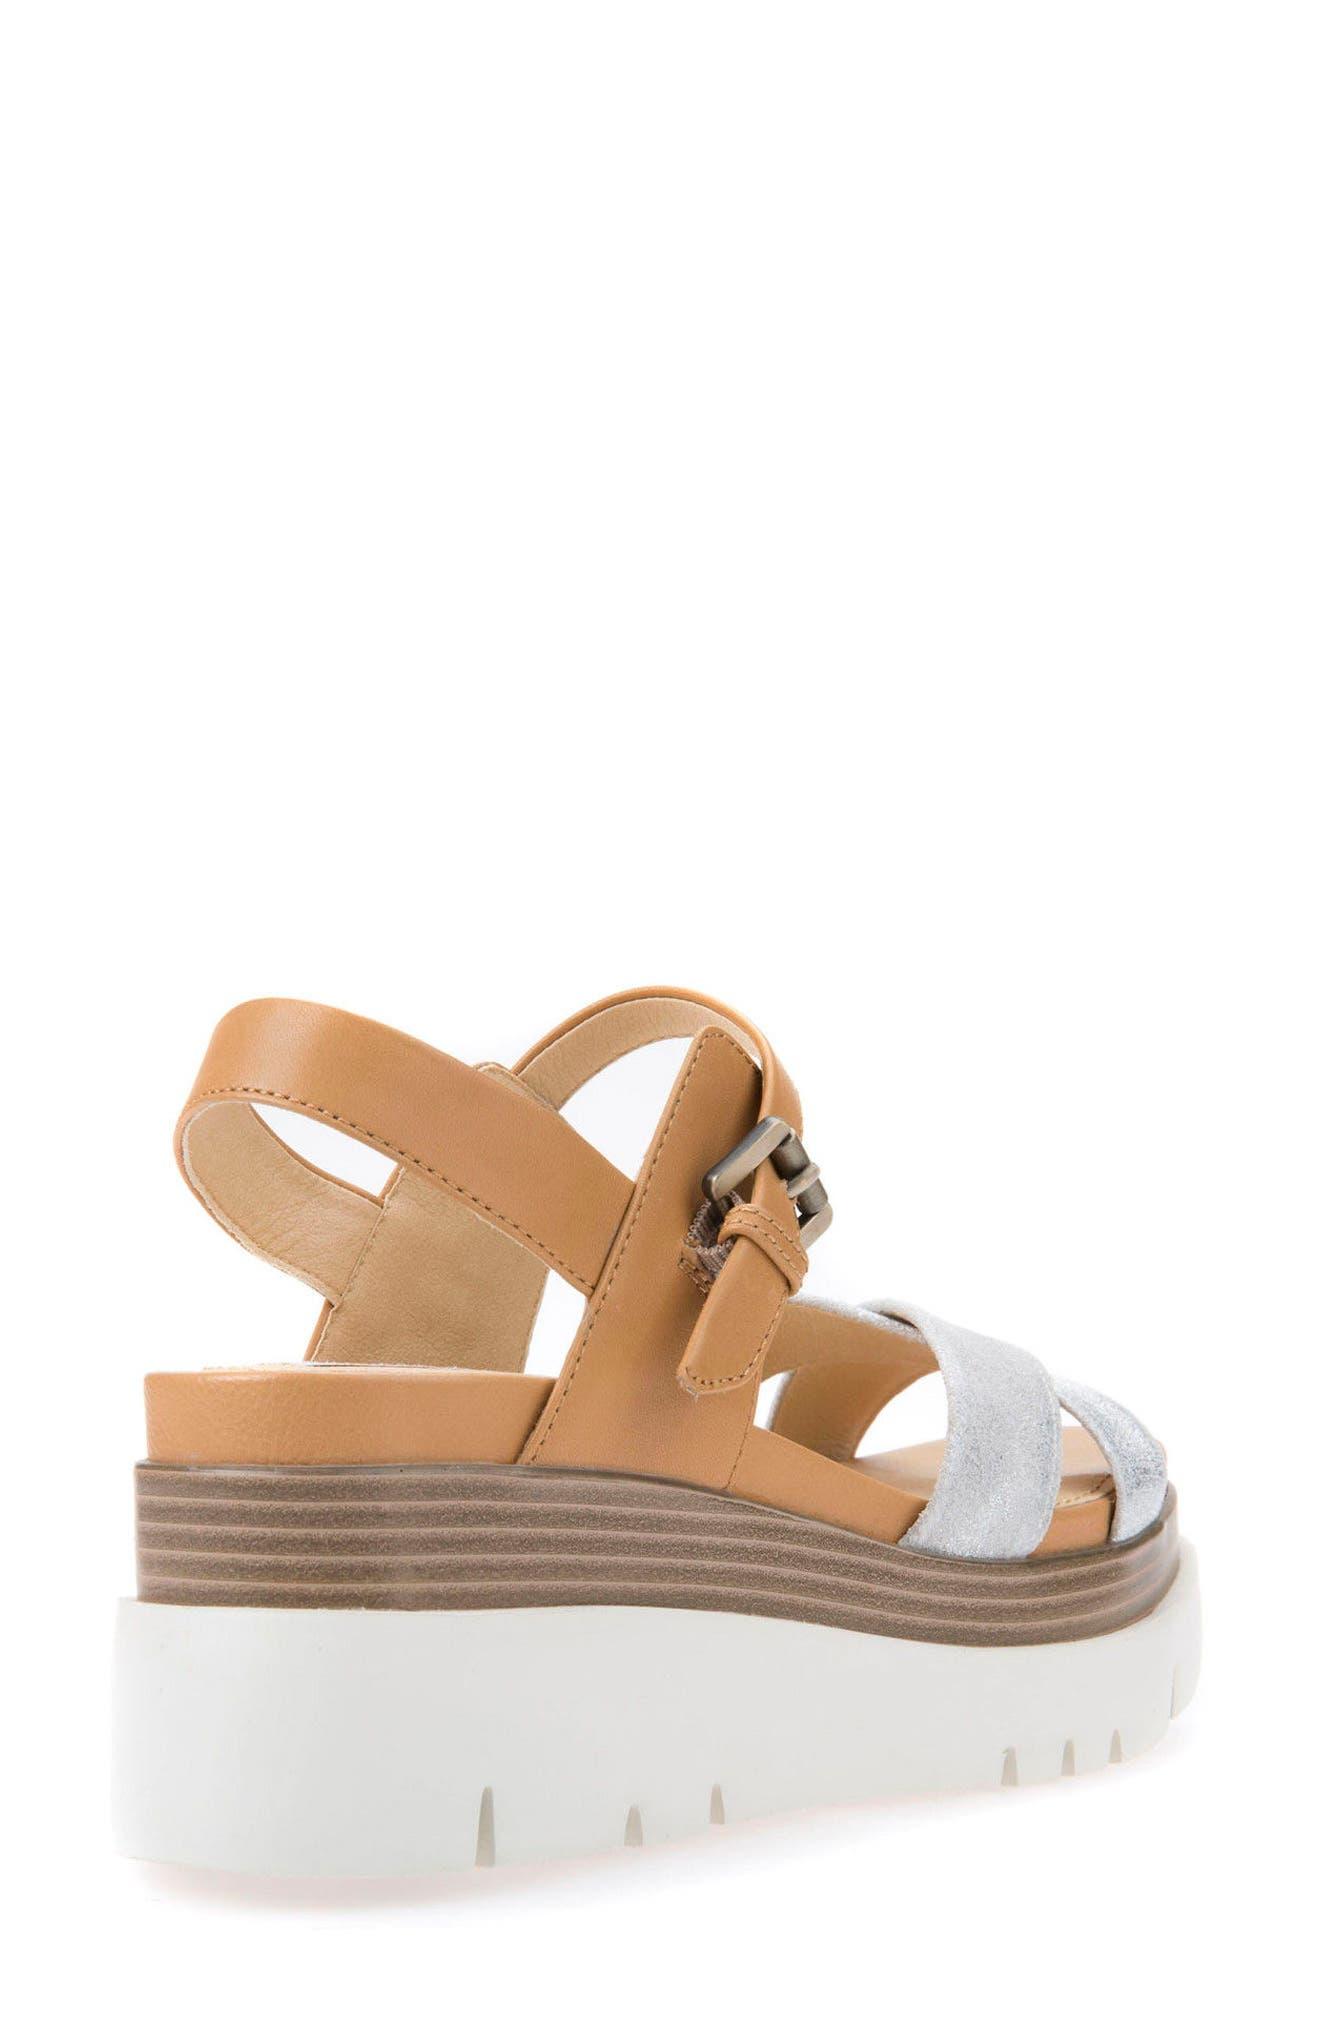 Radwa Platform Sandal,                             Alternate thumbnail 2, color,                             Off White Leather